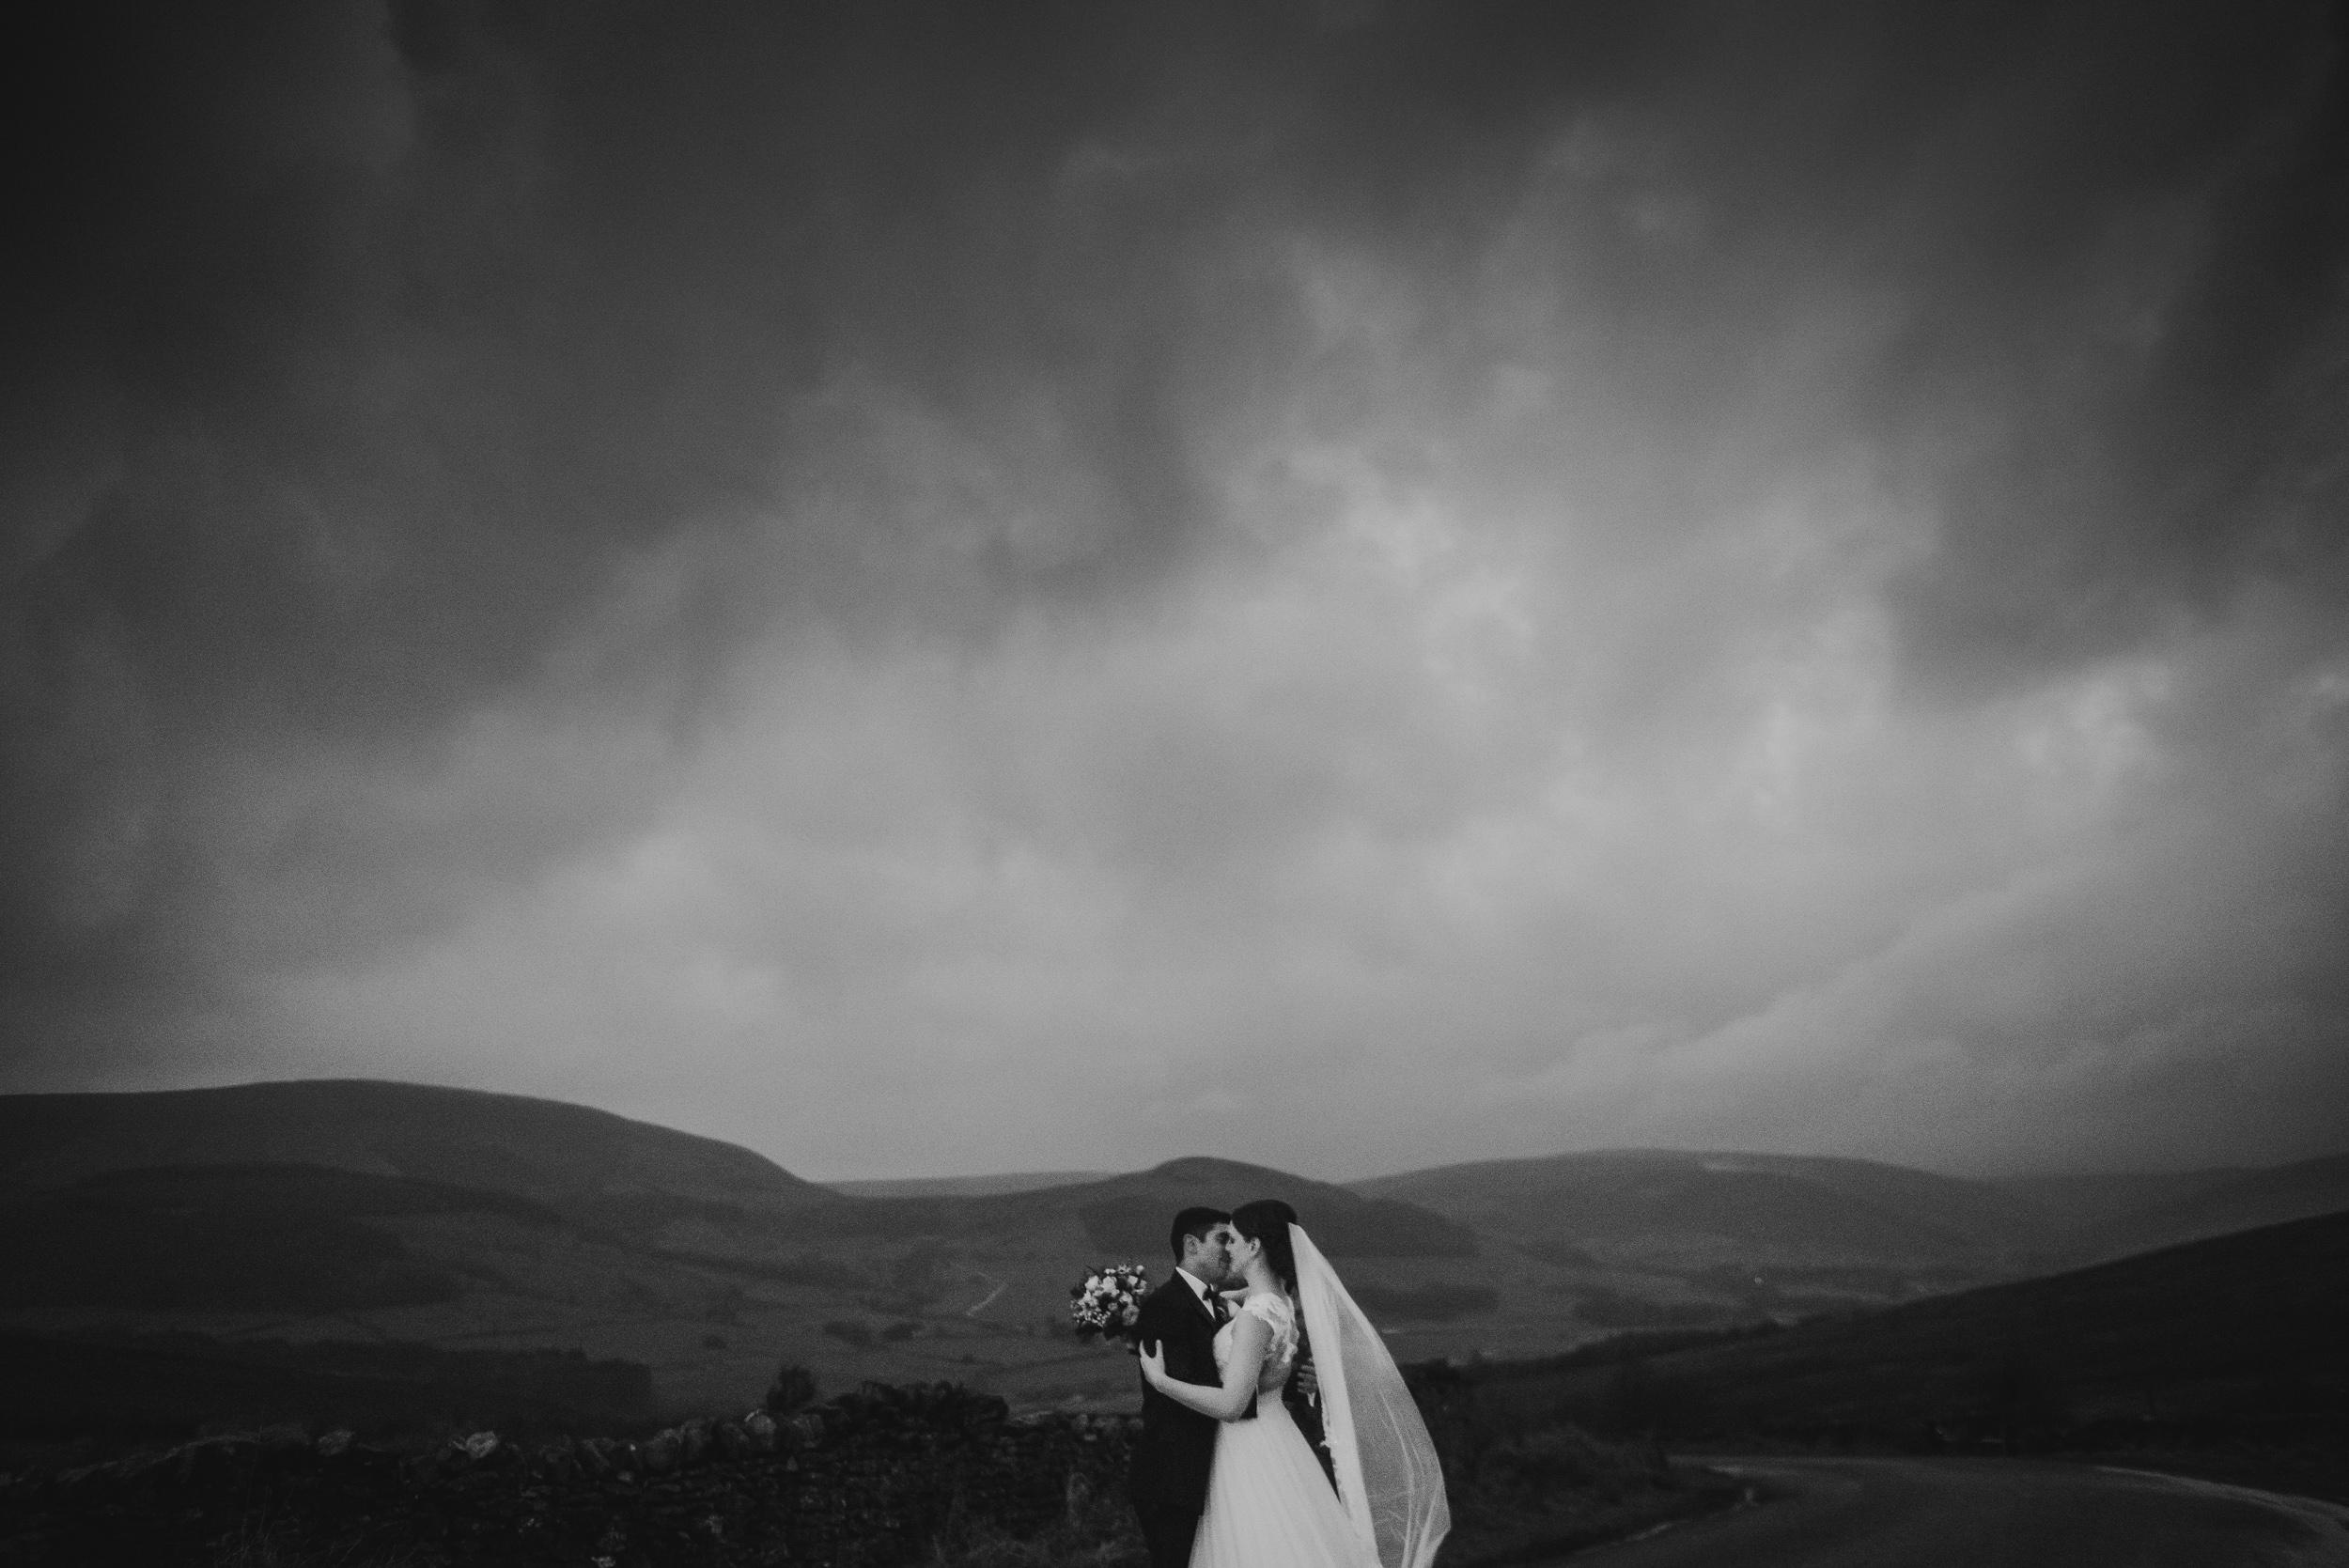 David Scholes Lancashire wedding photography 2016-196.jpg